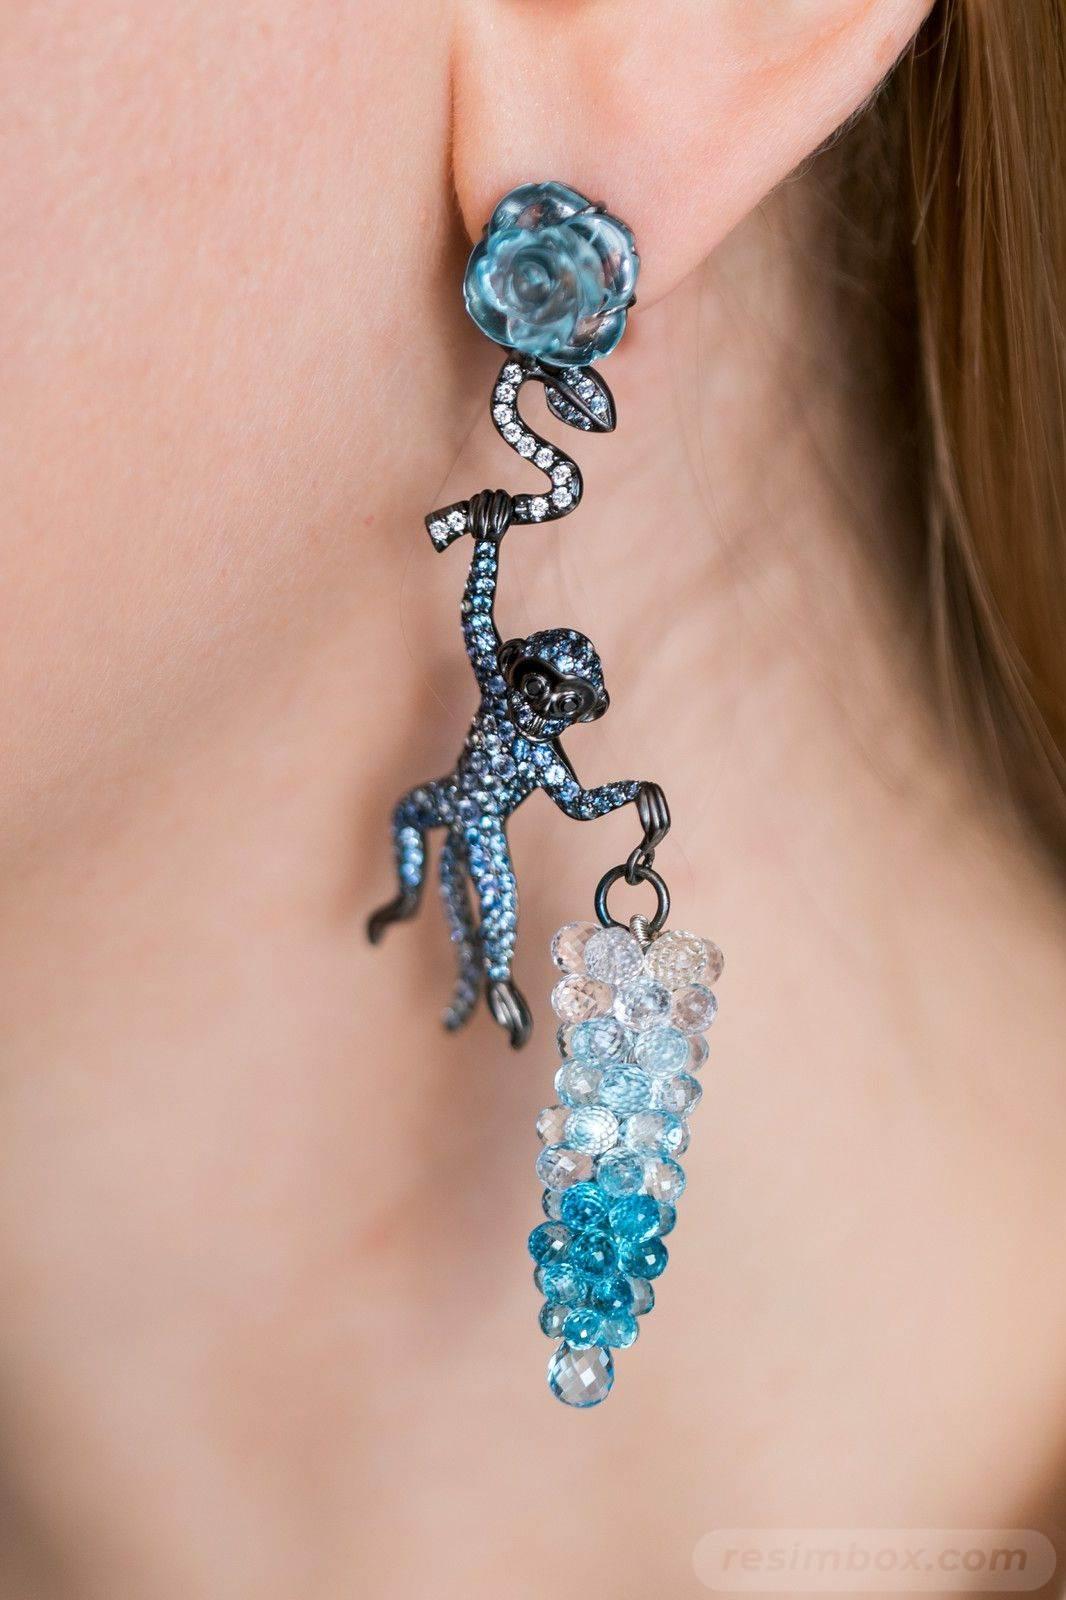 gemologue-animal-jewelry-curation-141652350767186902